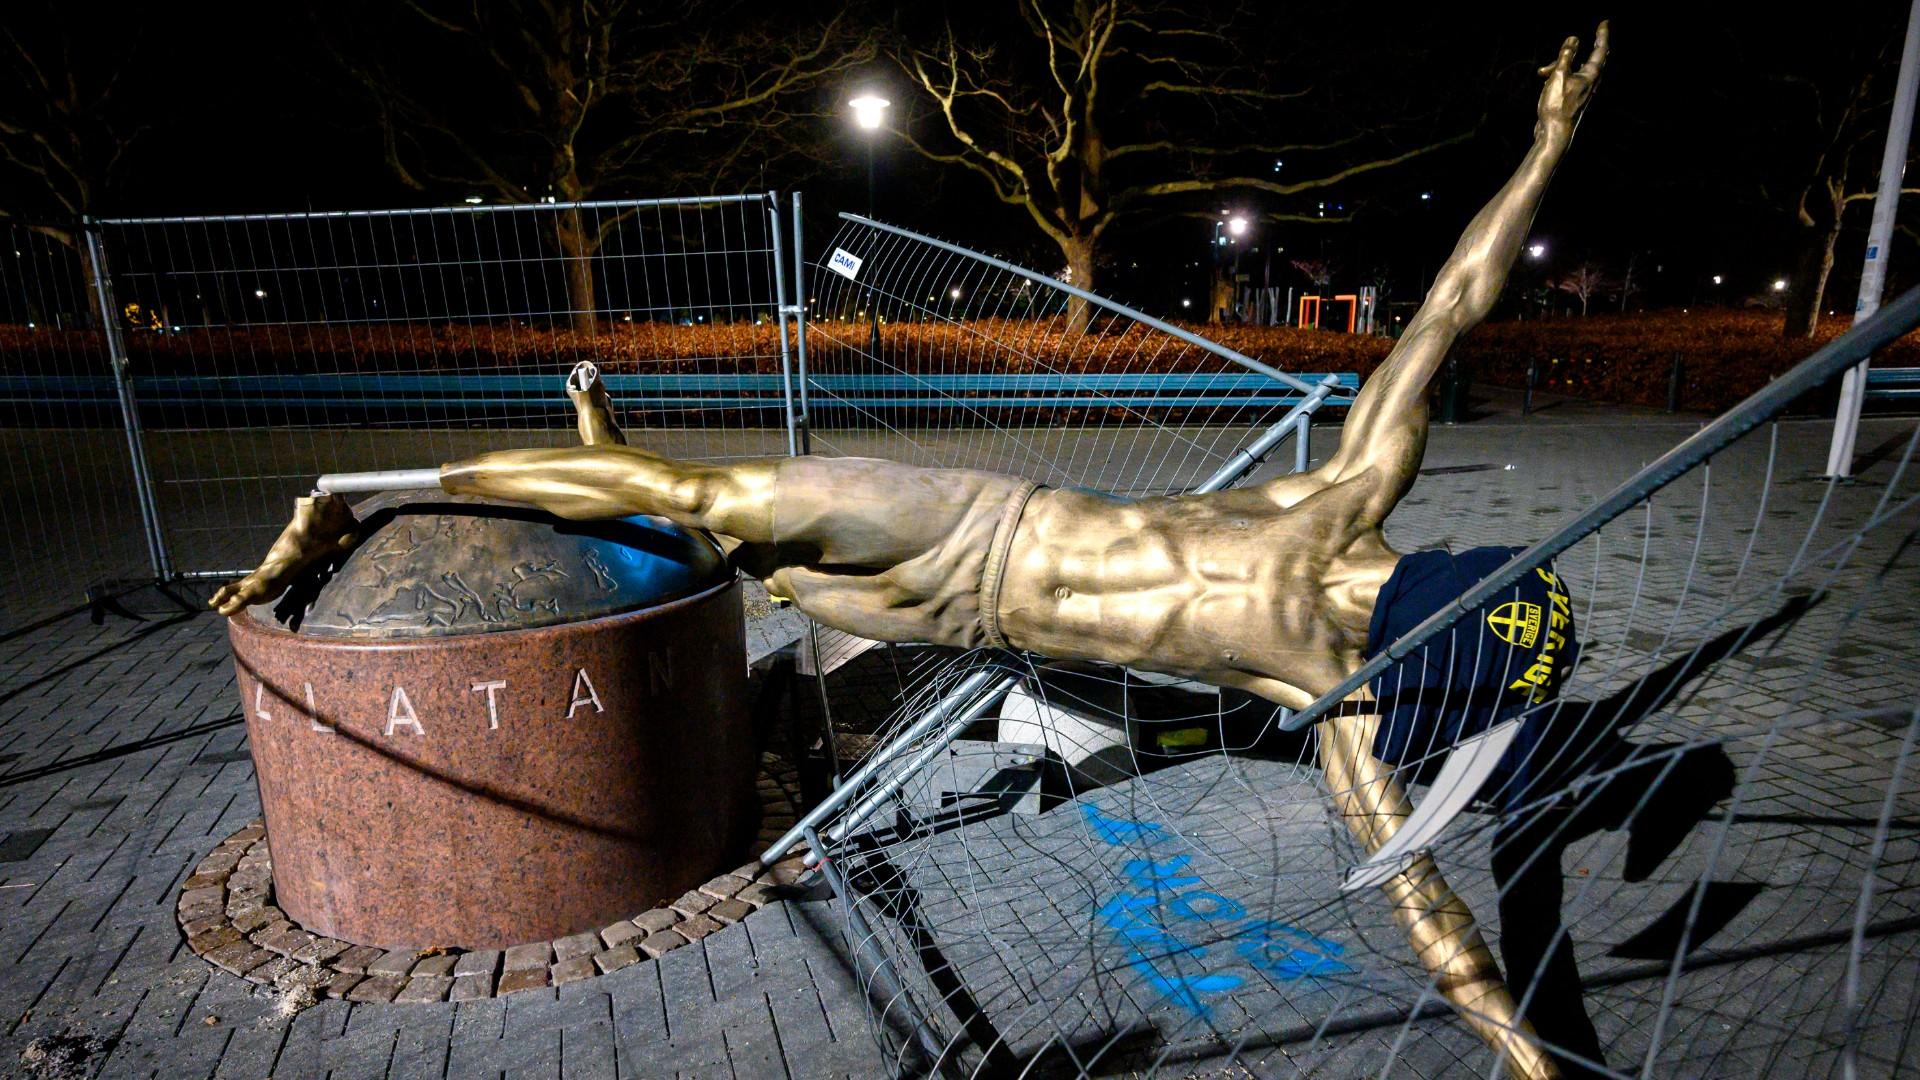 Statue Von Zlatan Ibrahimovic In Malmo Oberhalb Der Fusse Abgesagt Goal Com